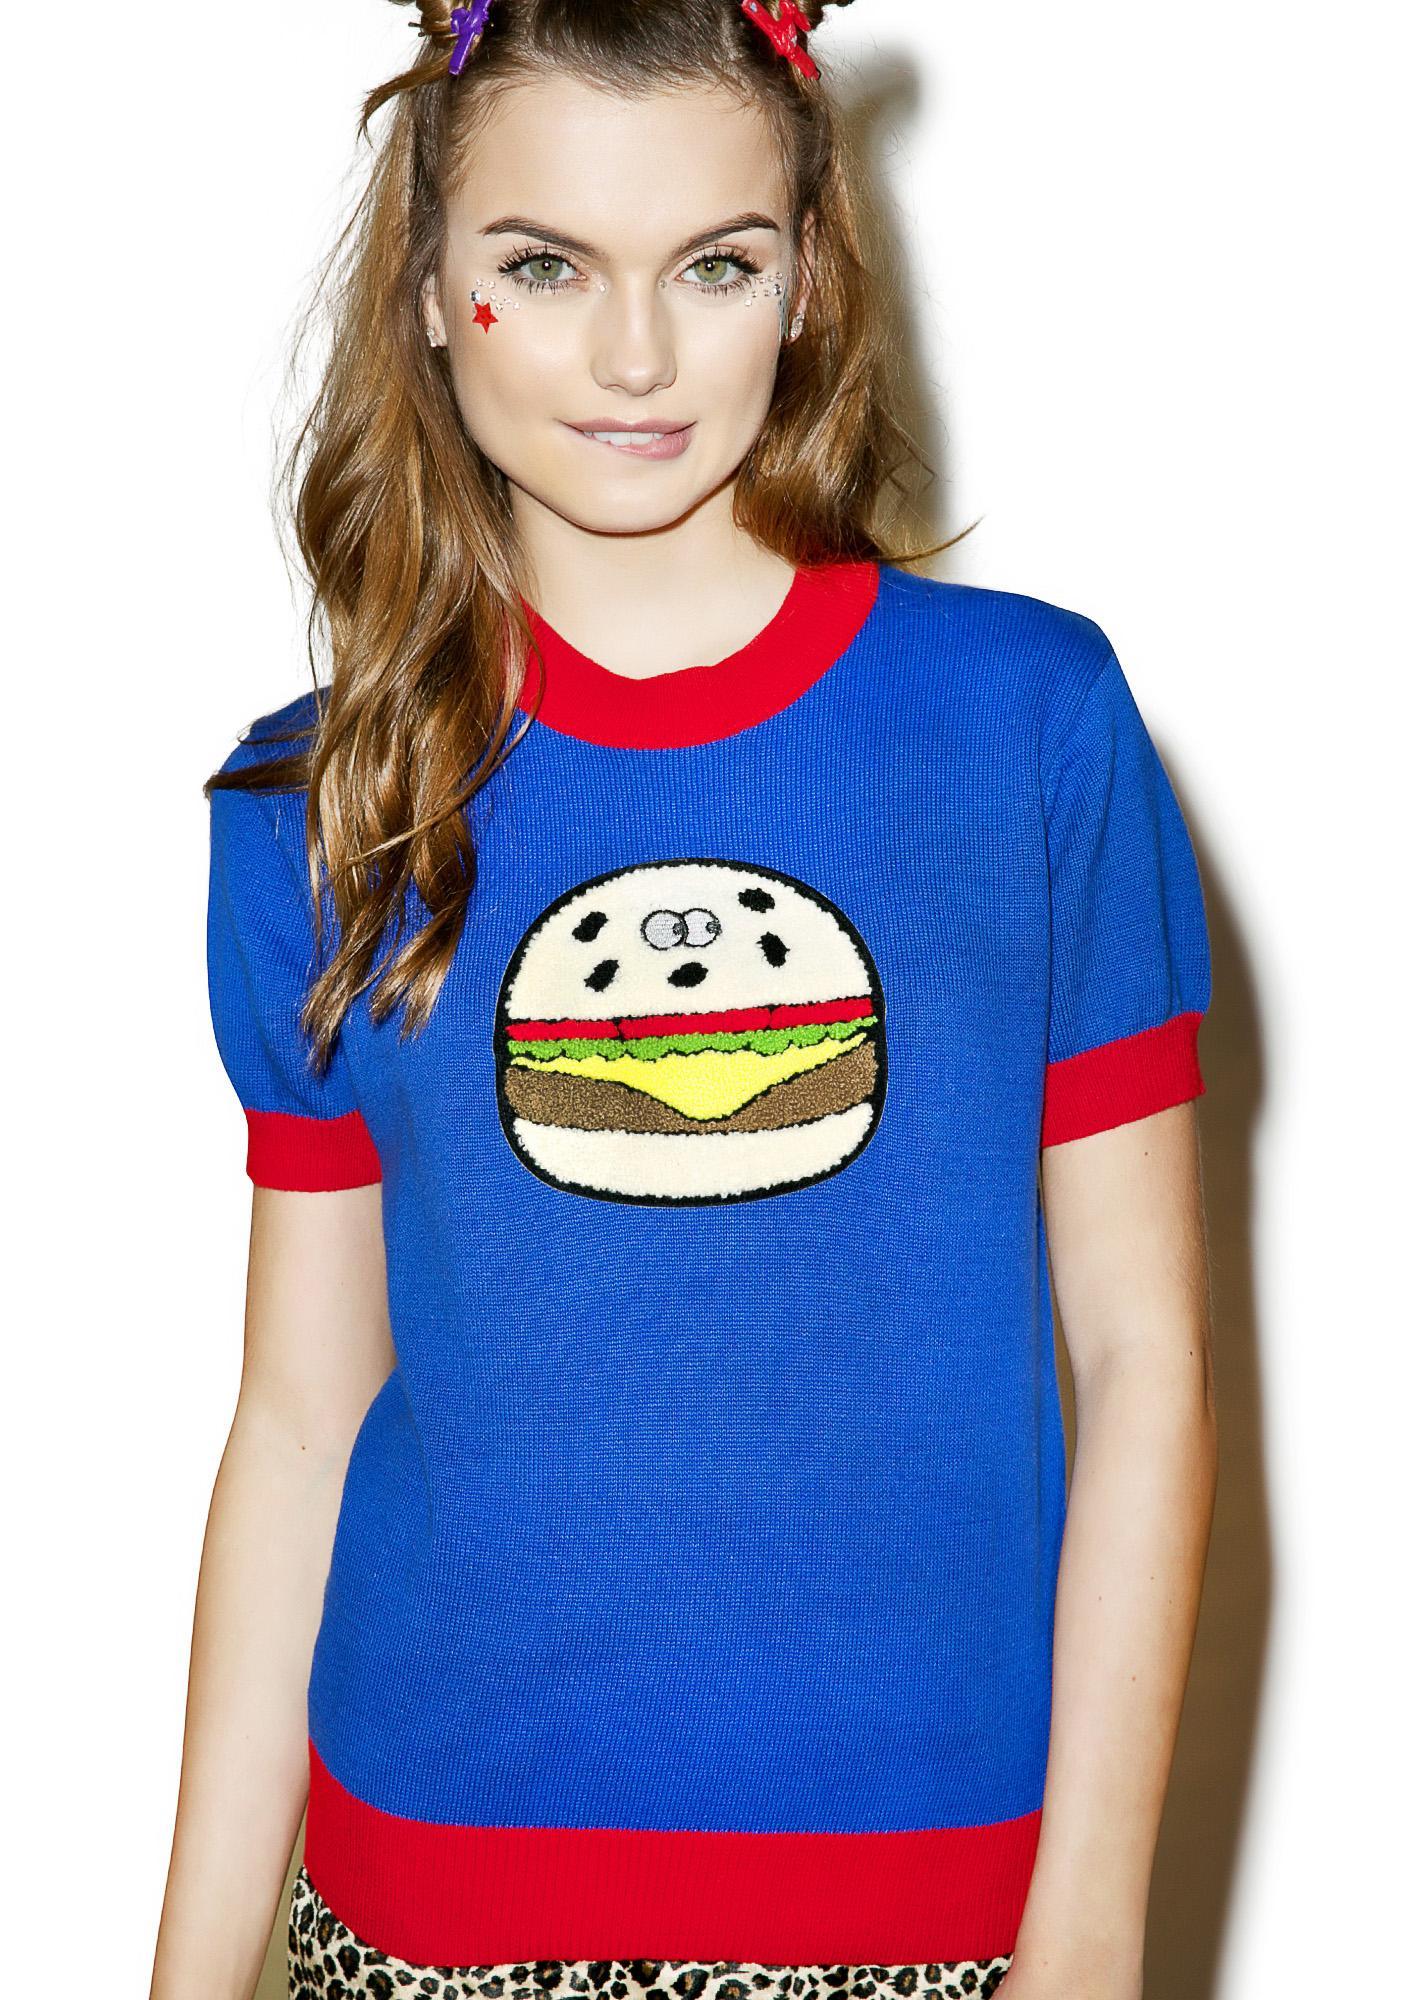 Lazy Oaf Burger Knit Top